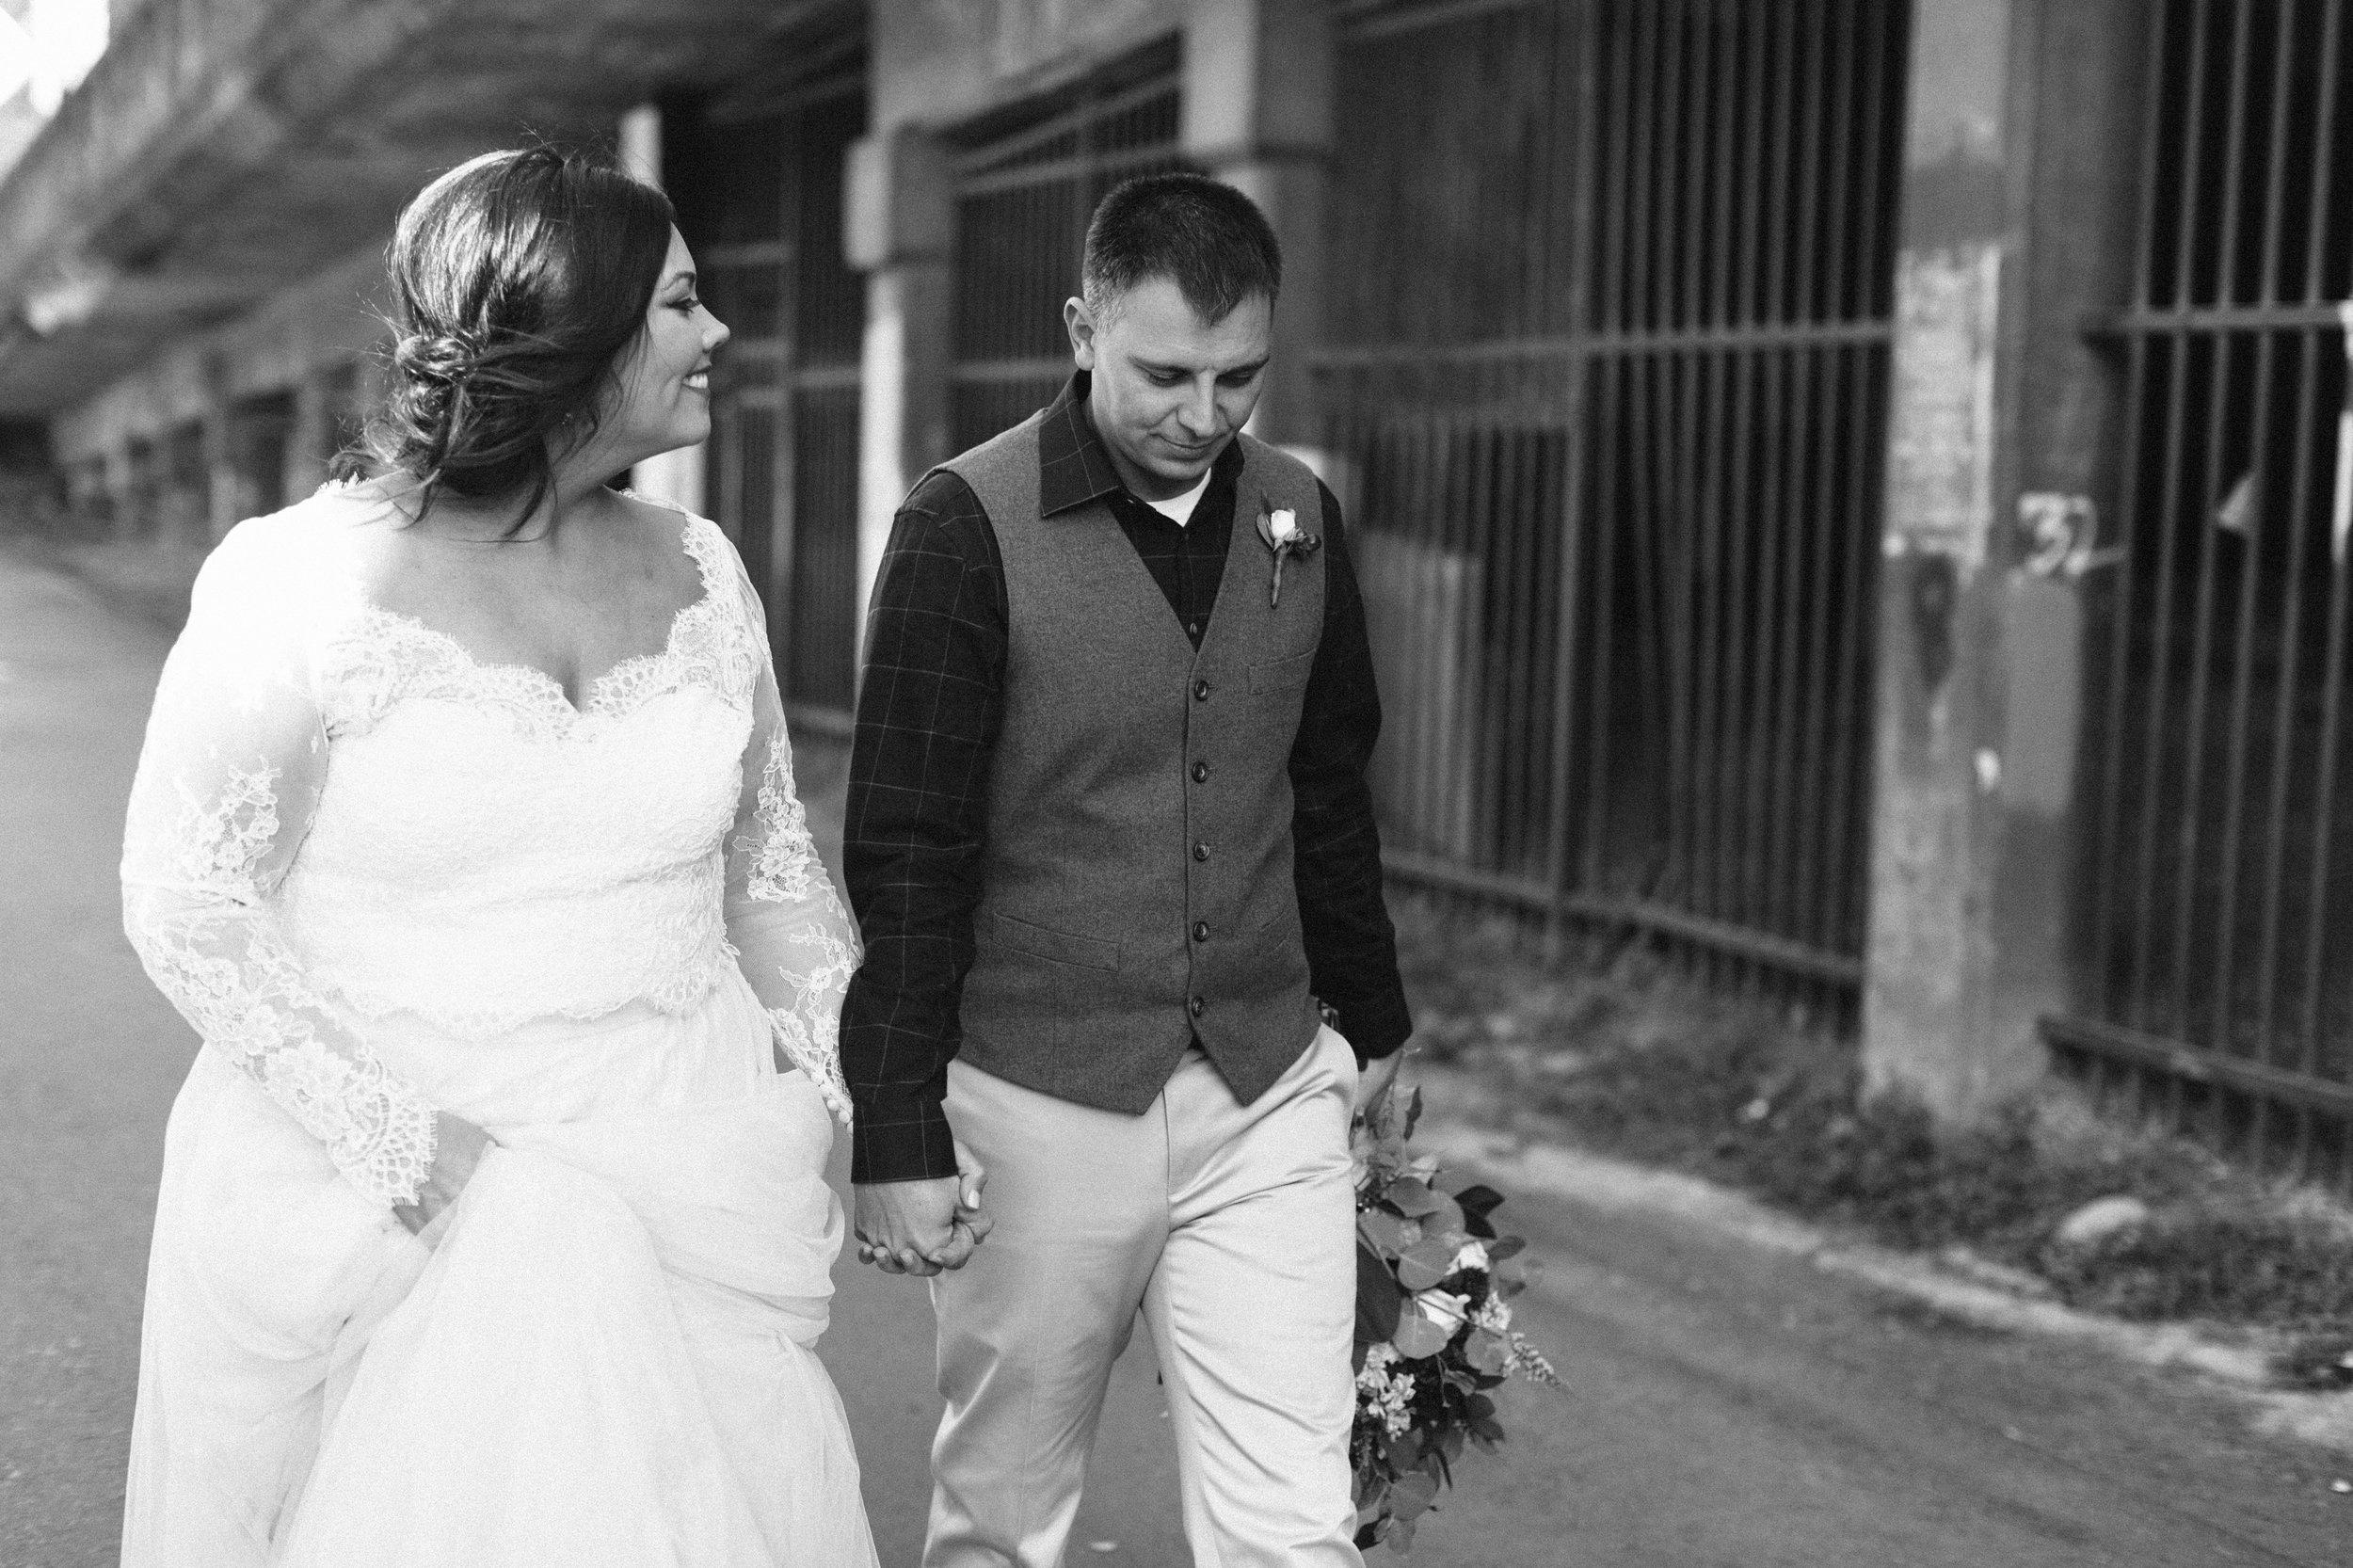 Lauren_Jeremy_Standard_Wedding_Knoxville_Abigail_Malone_Photography_FIlm-301.jpg